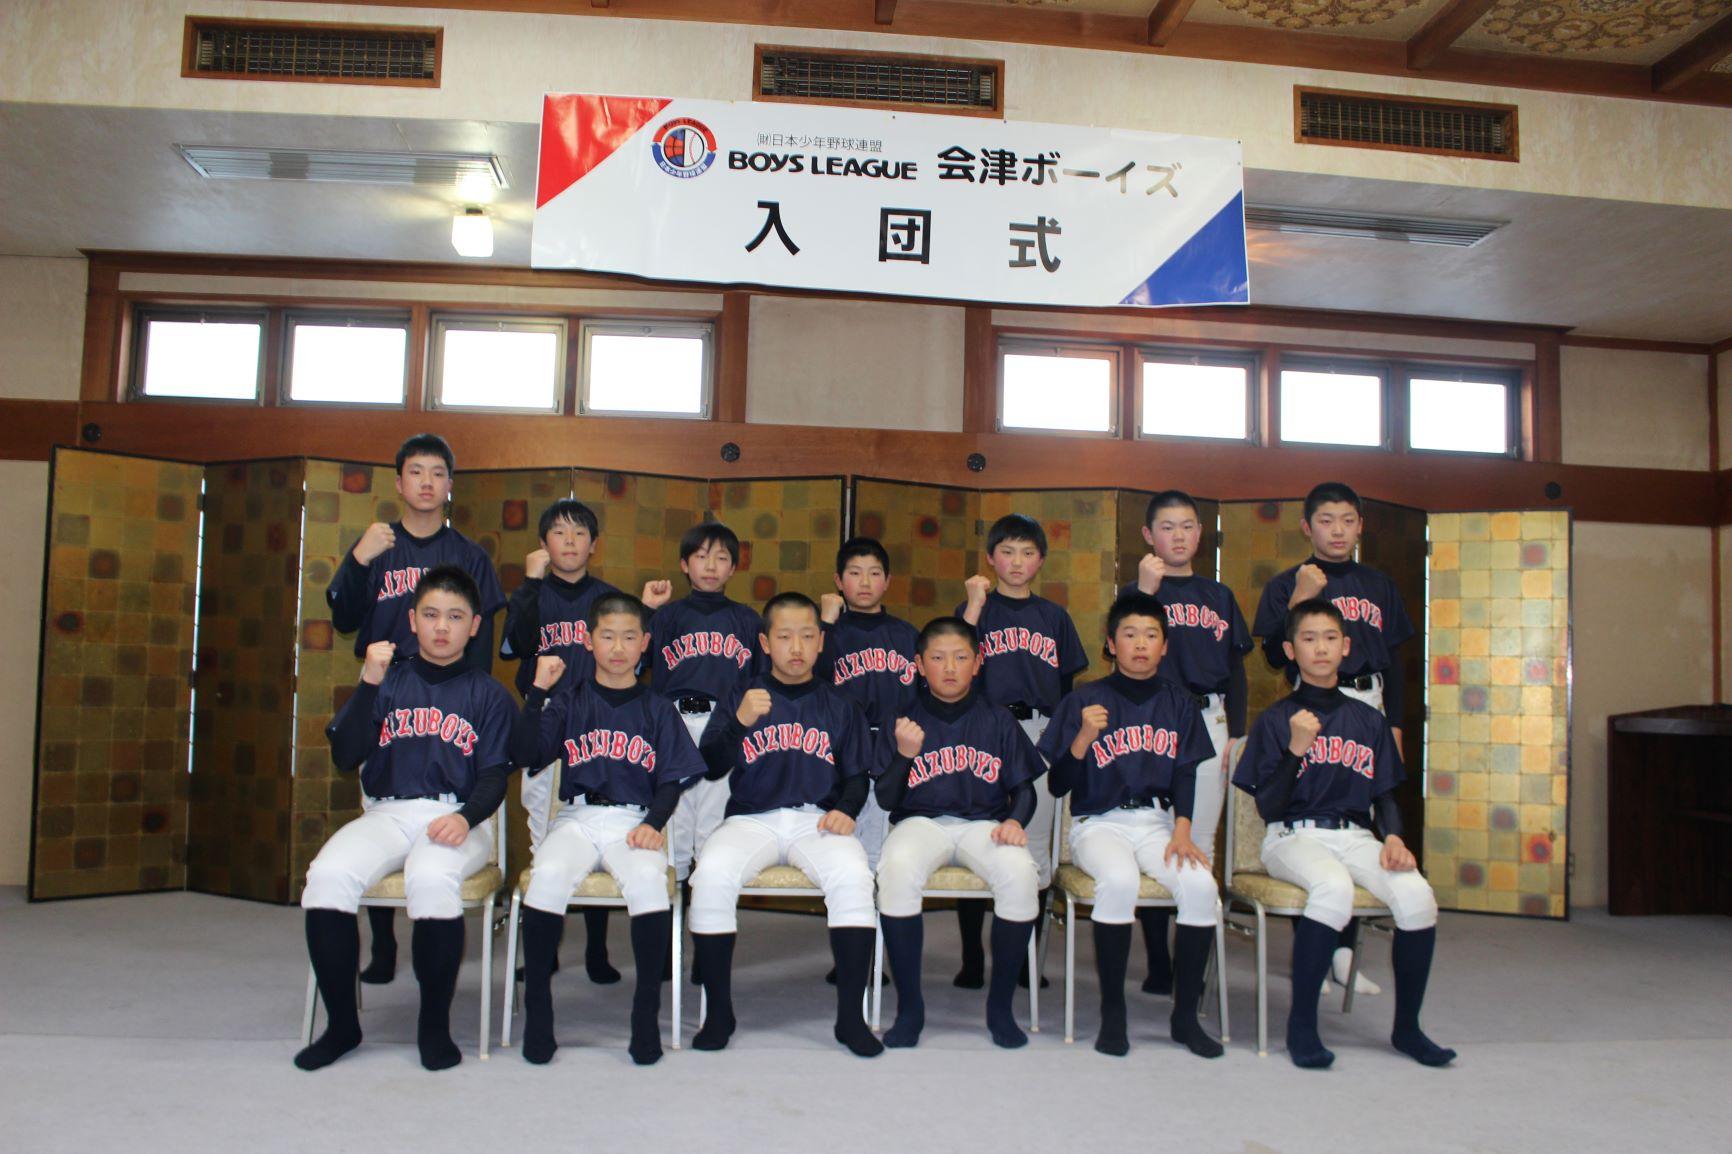 2019-3-16 入団式